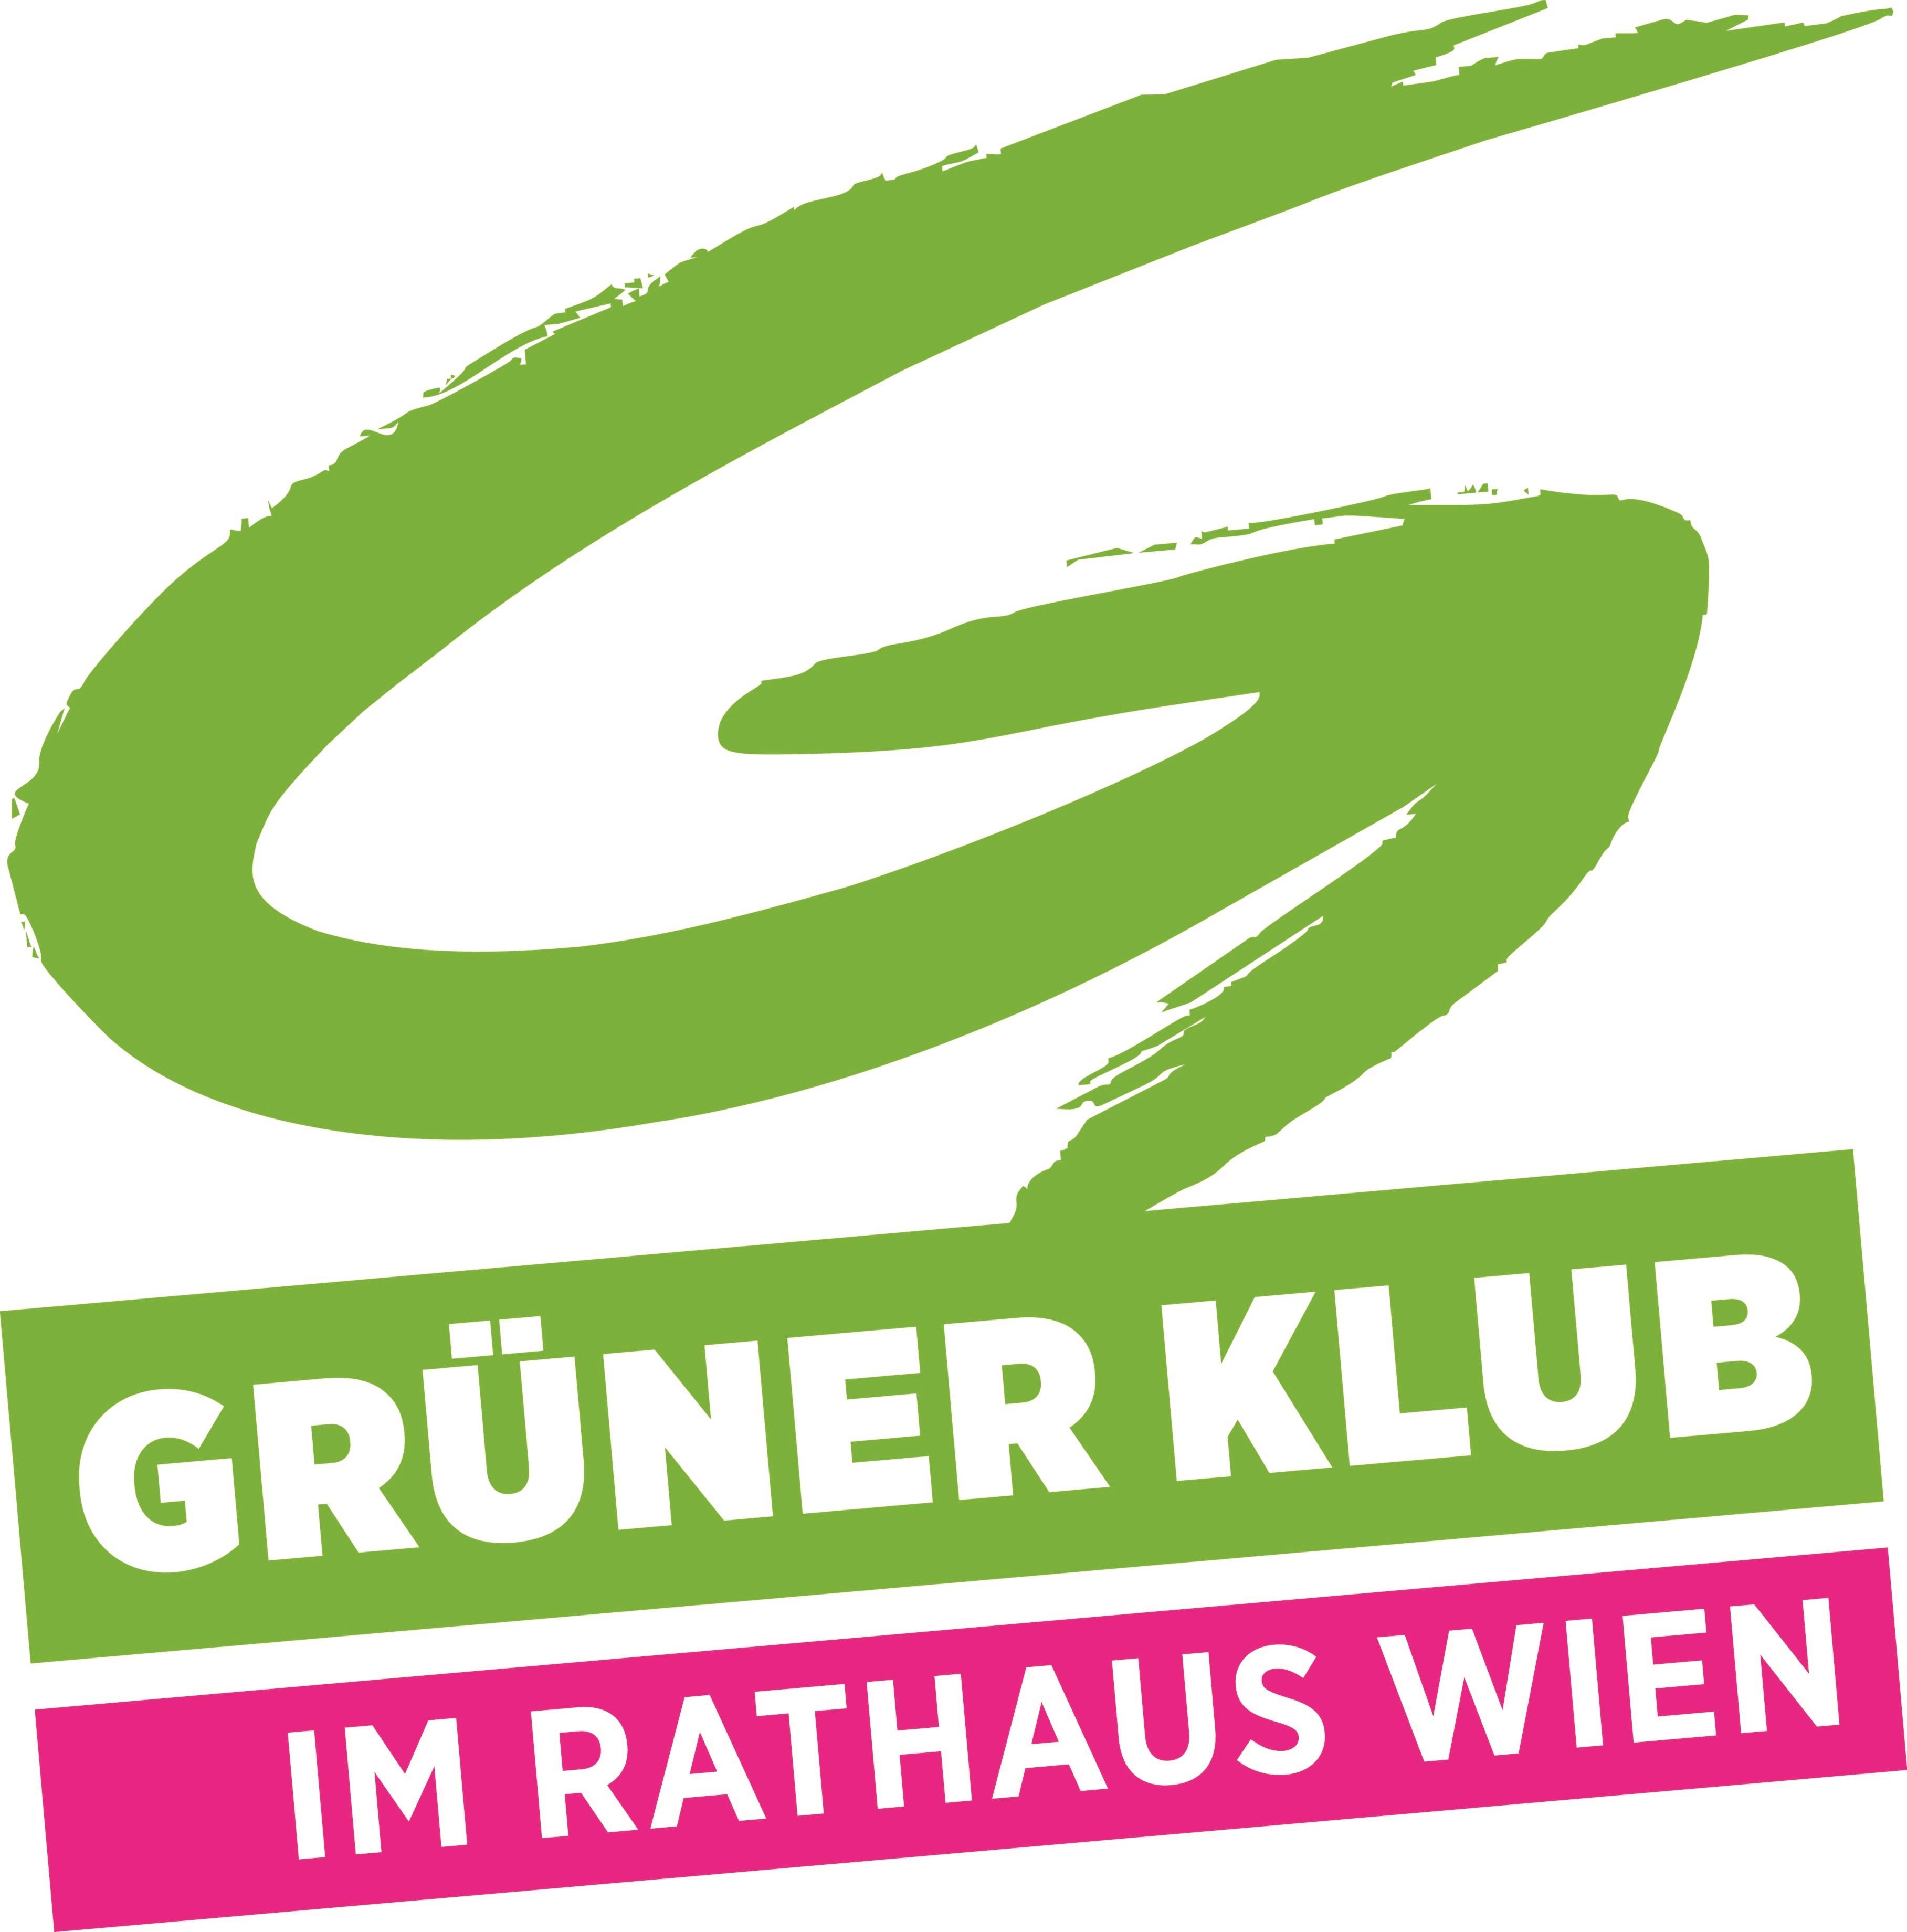 GruenerKlubRathausWien.eps